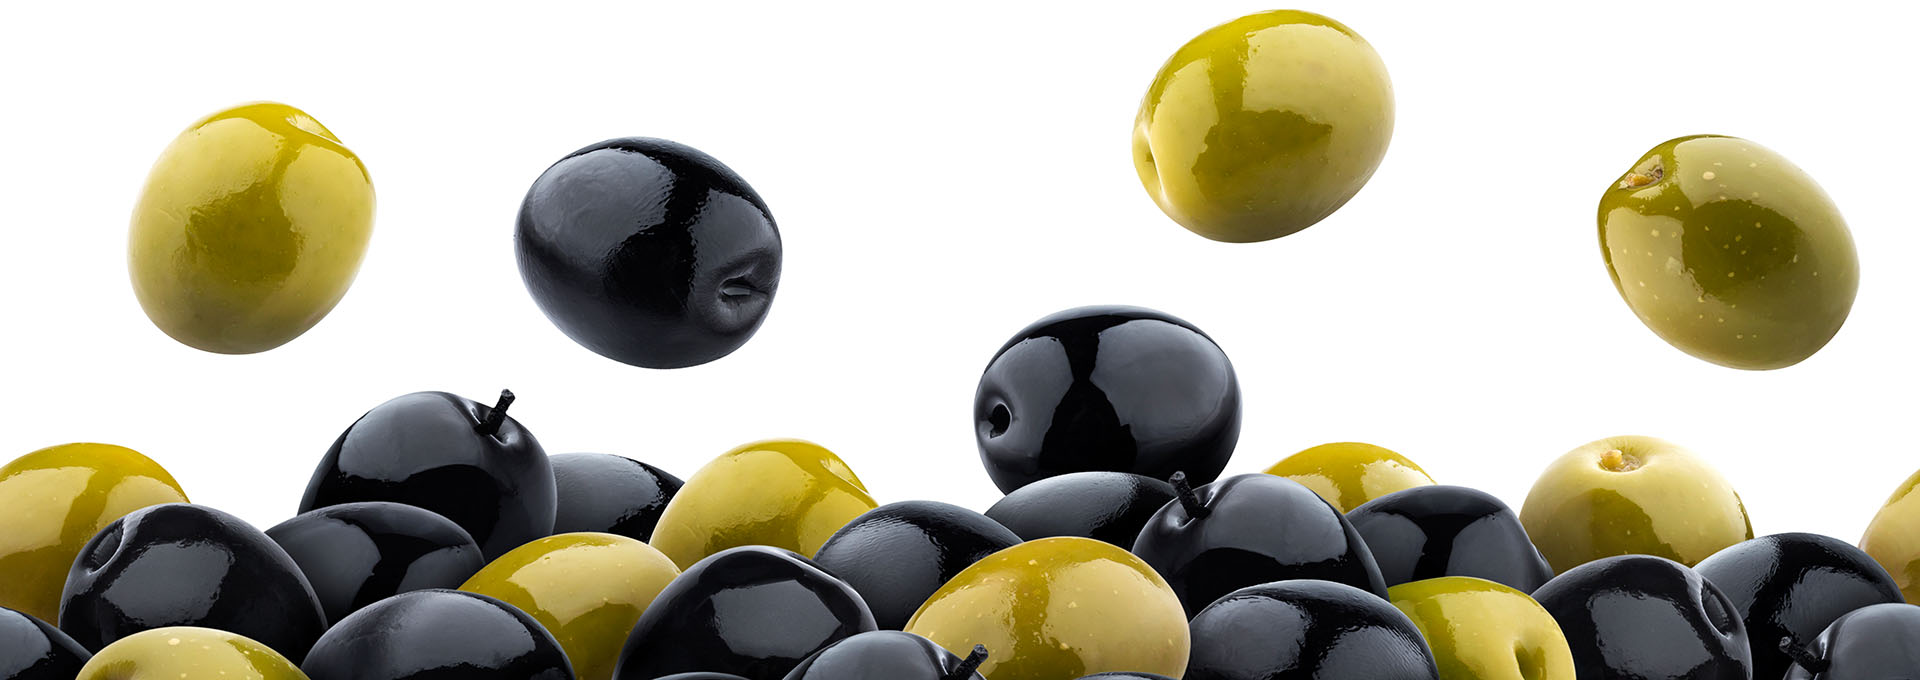 Cuisine-Lifestyle - Olivenöl Shop - Hintergrundbild - Olivenlandschaft